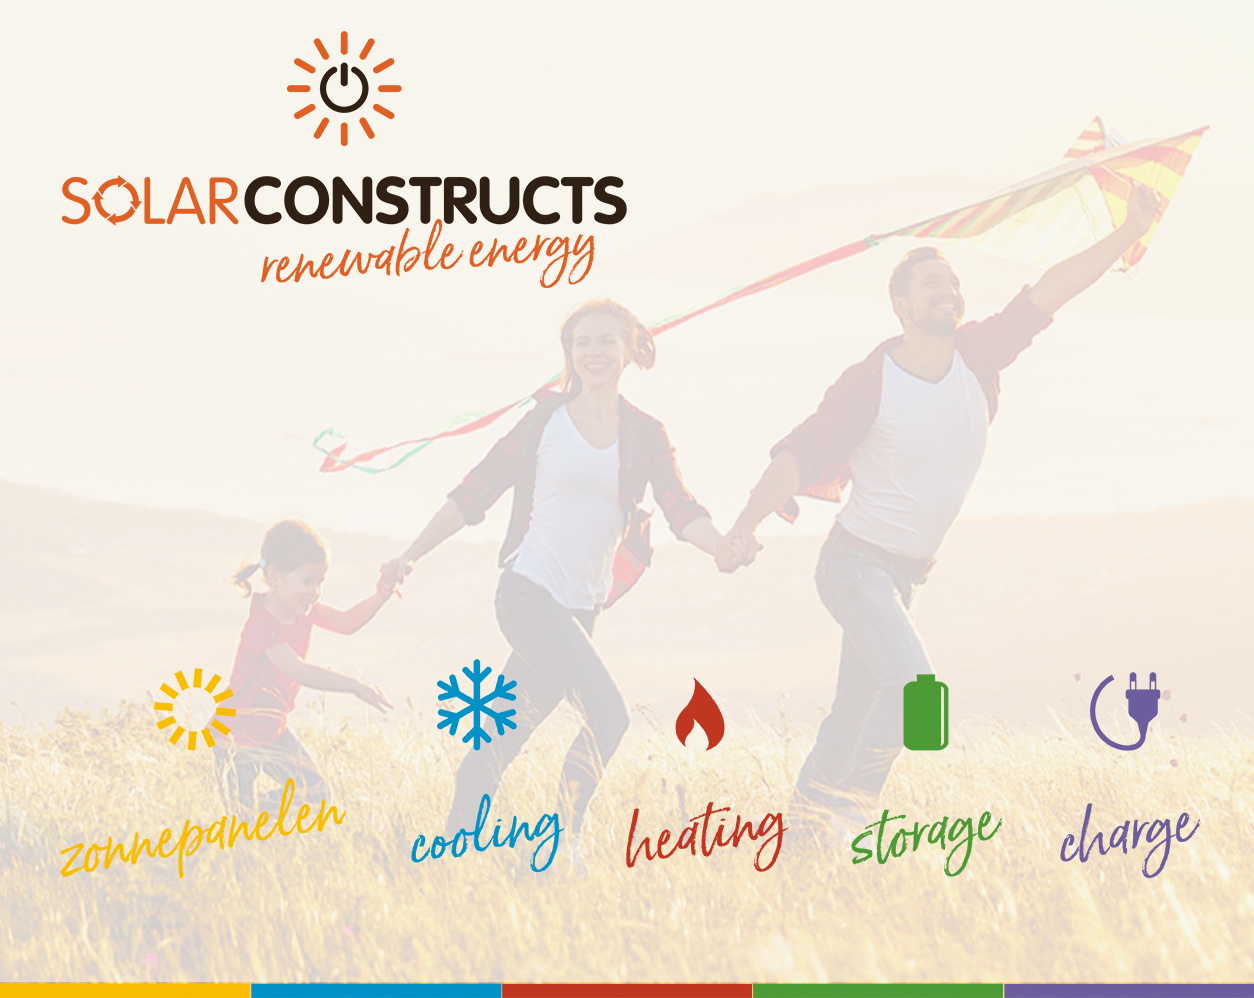 Solarconstructs Renewable Energy